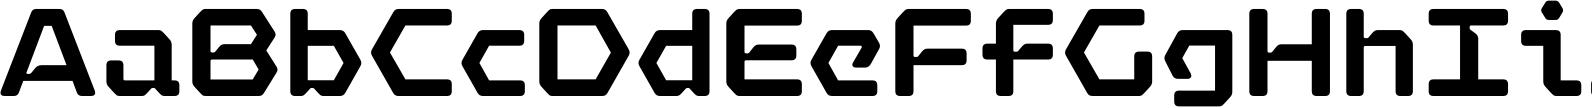 Hexaframe CF